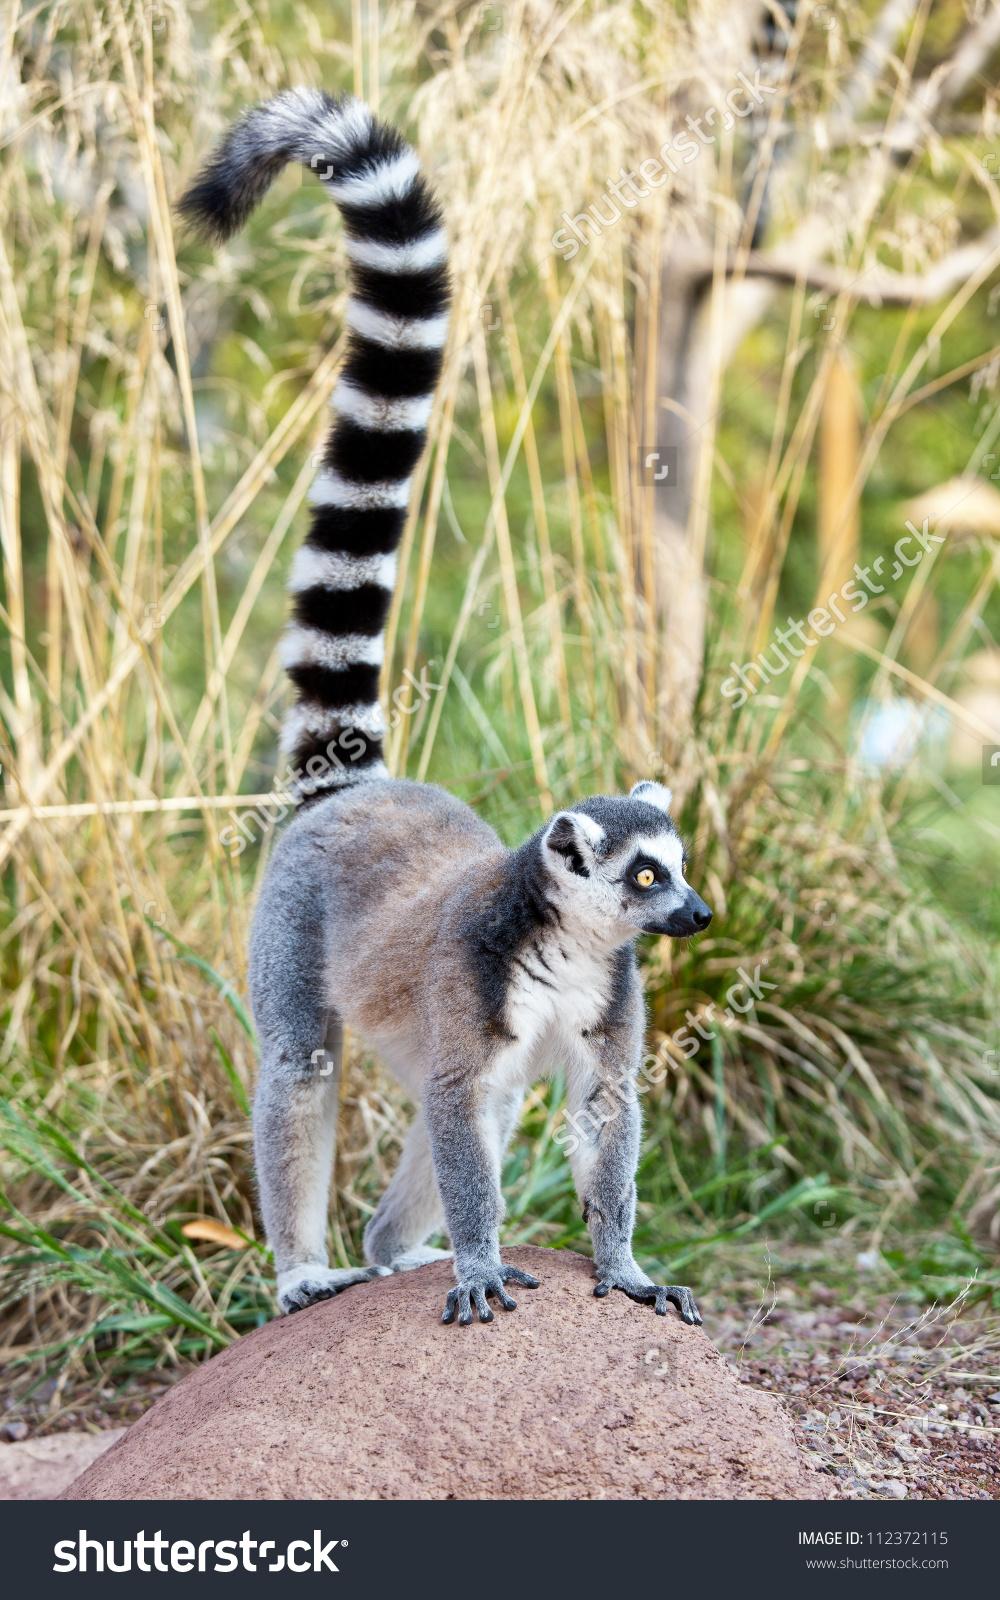 Ringtailed Lemur Lemur Catta Clade Strepsirrhine Stock Photo.